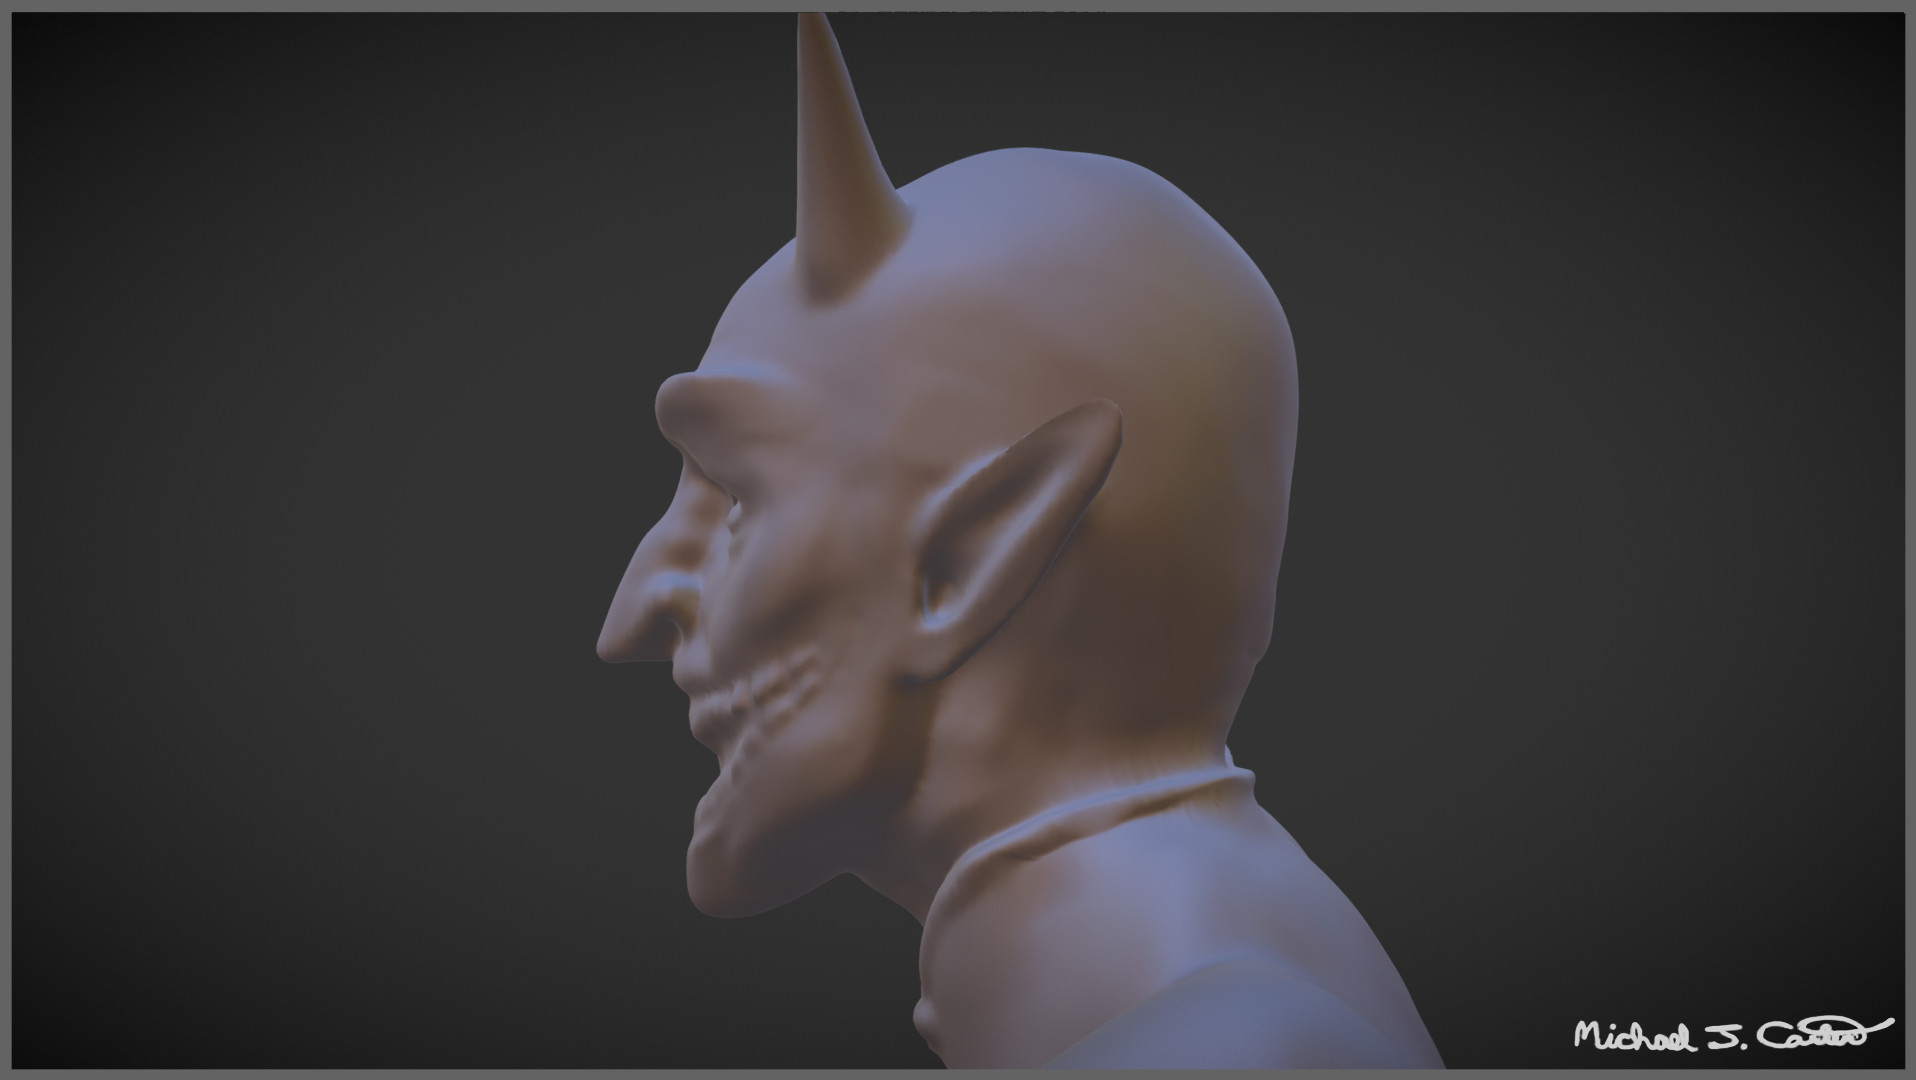 Michael jake carter mcarter demon sculpt side image